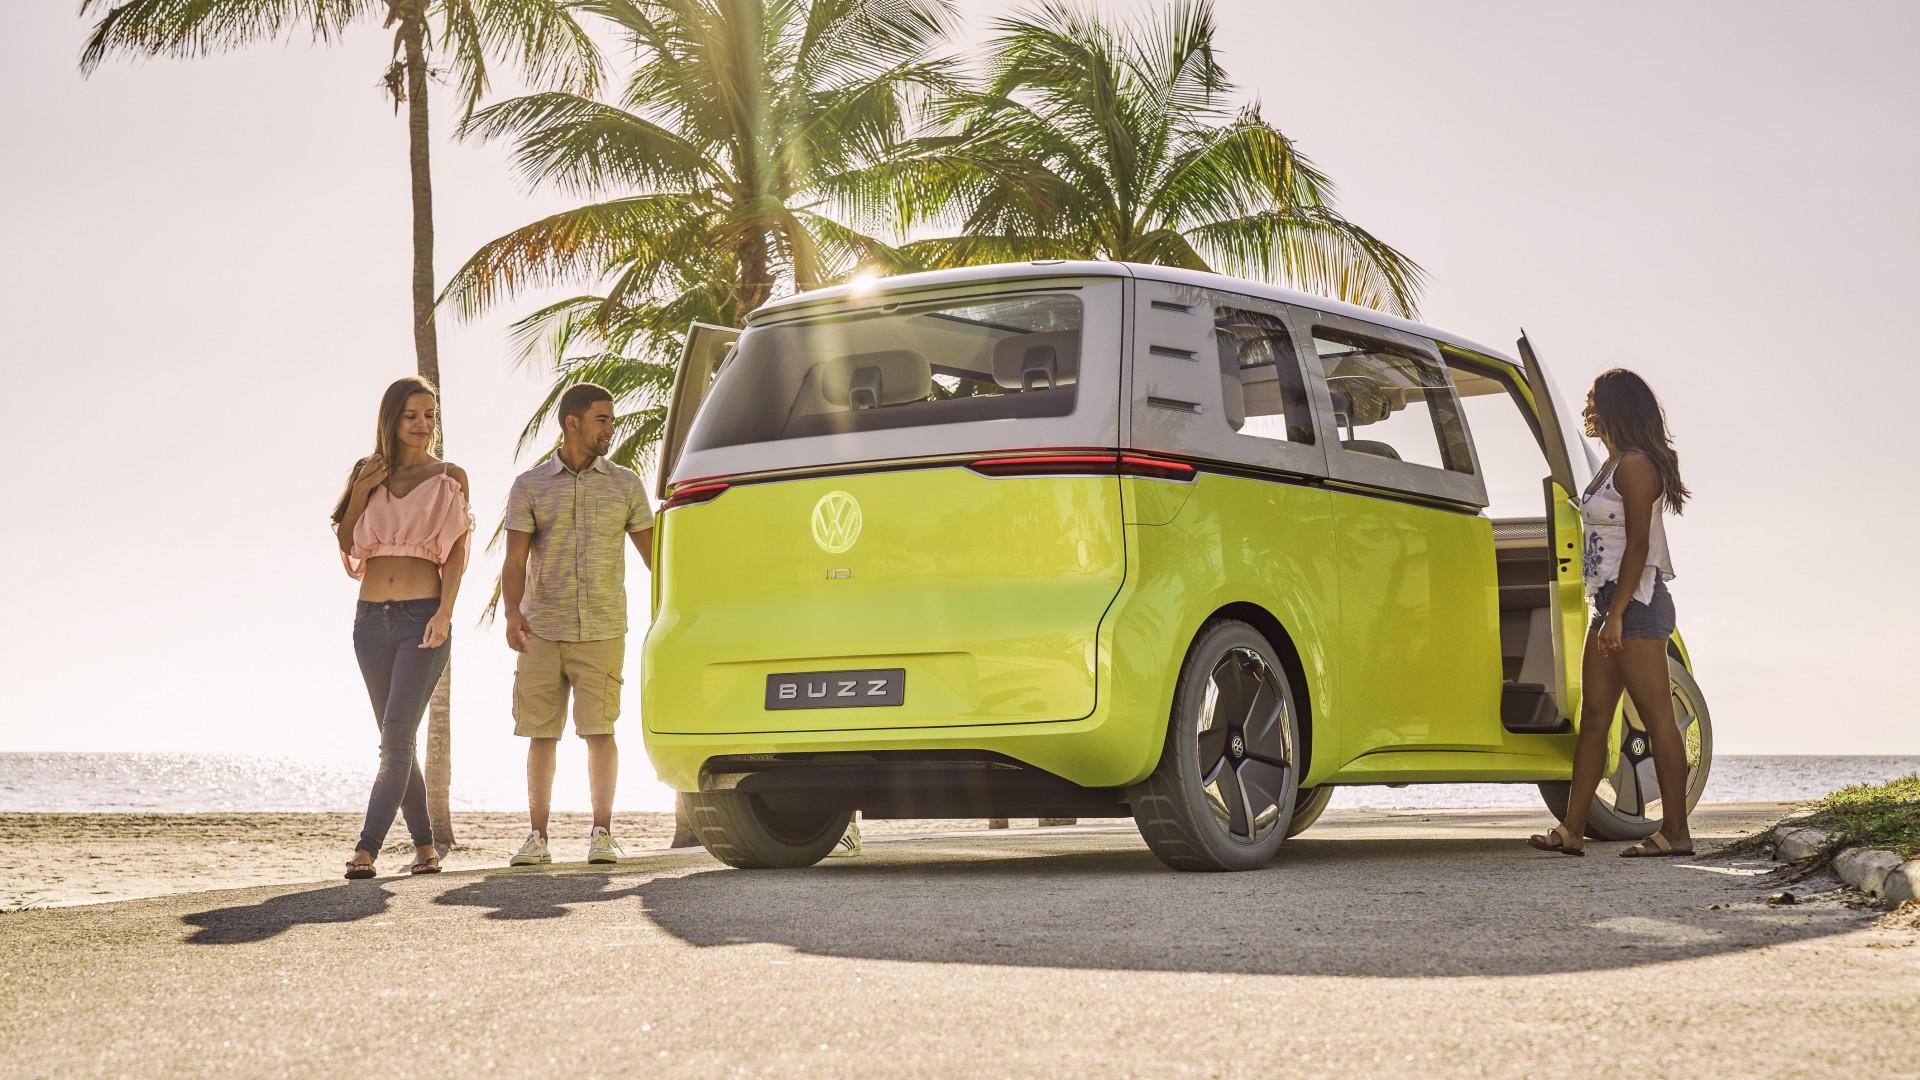 wallpaper volkswagen id buzz 2021 cars electric car 4k